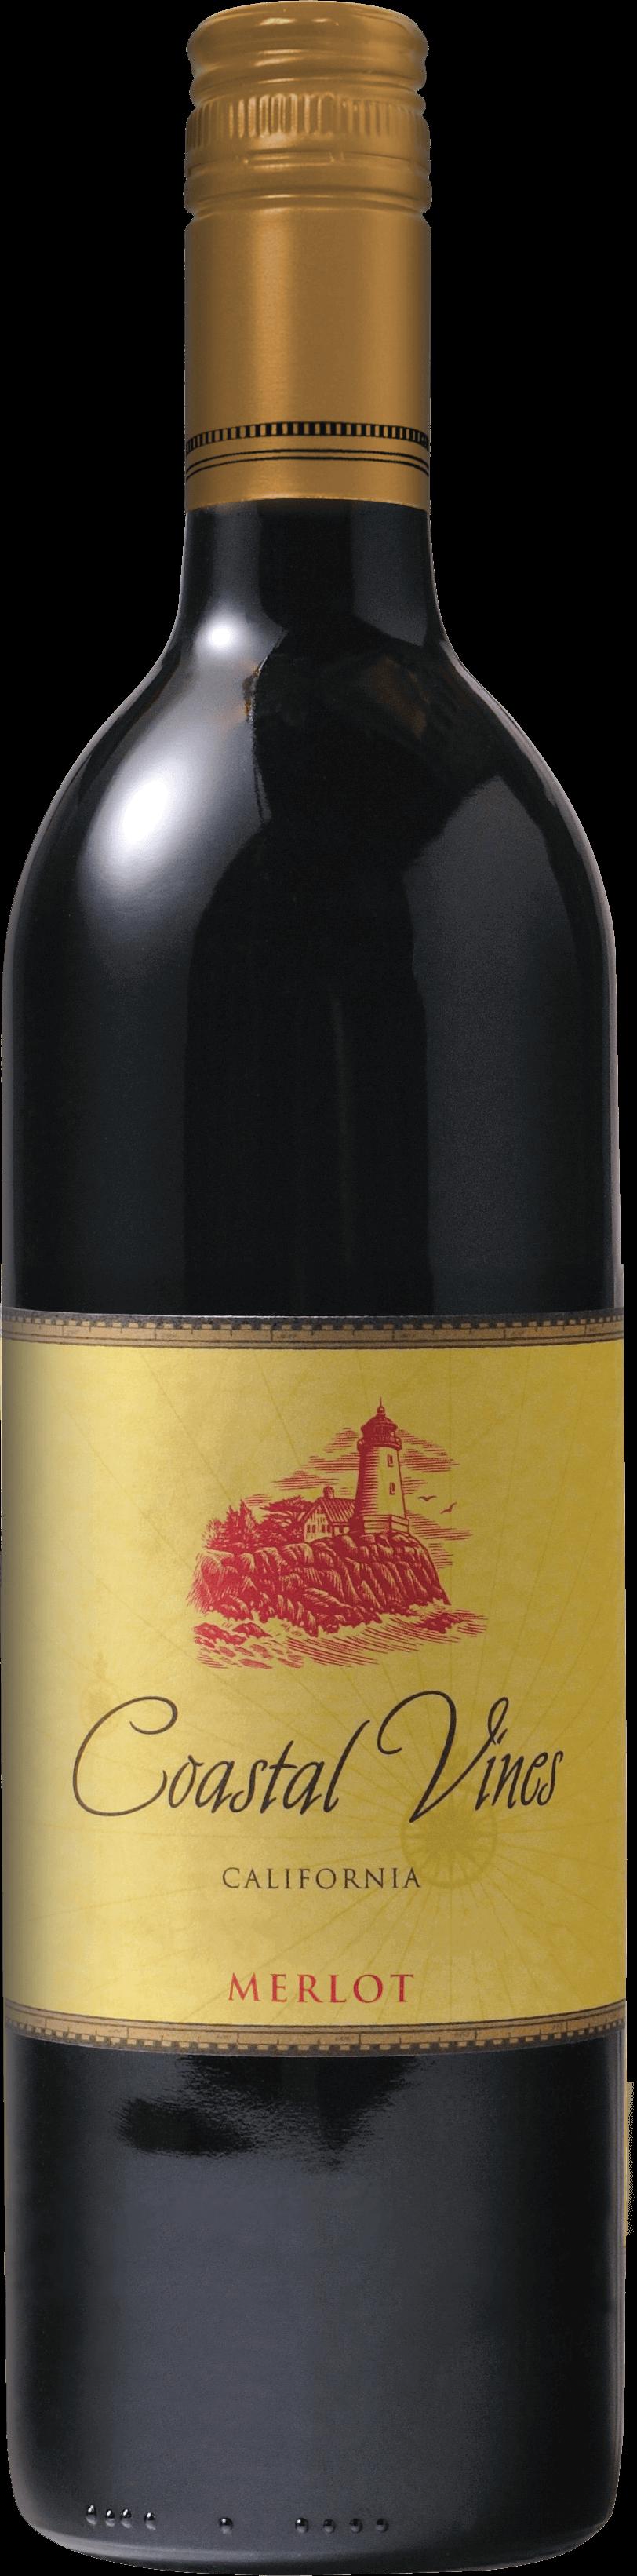 Coastal Vines Merlot Bottleshot